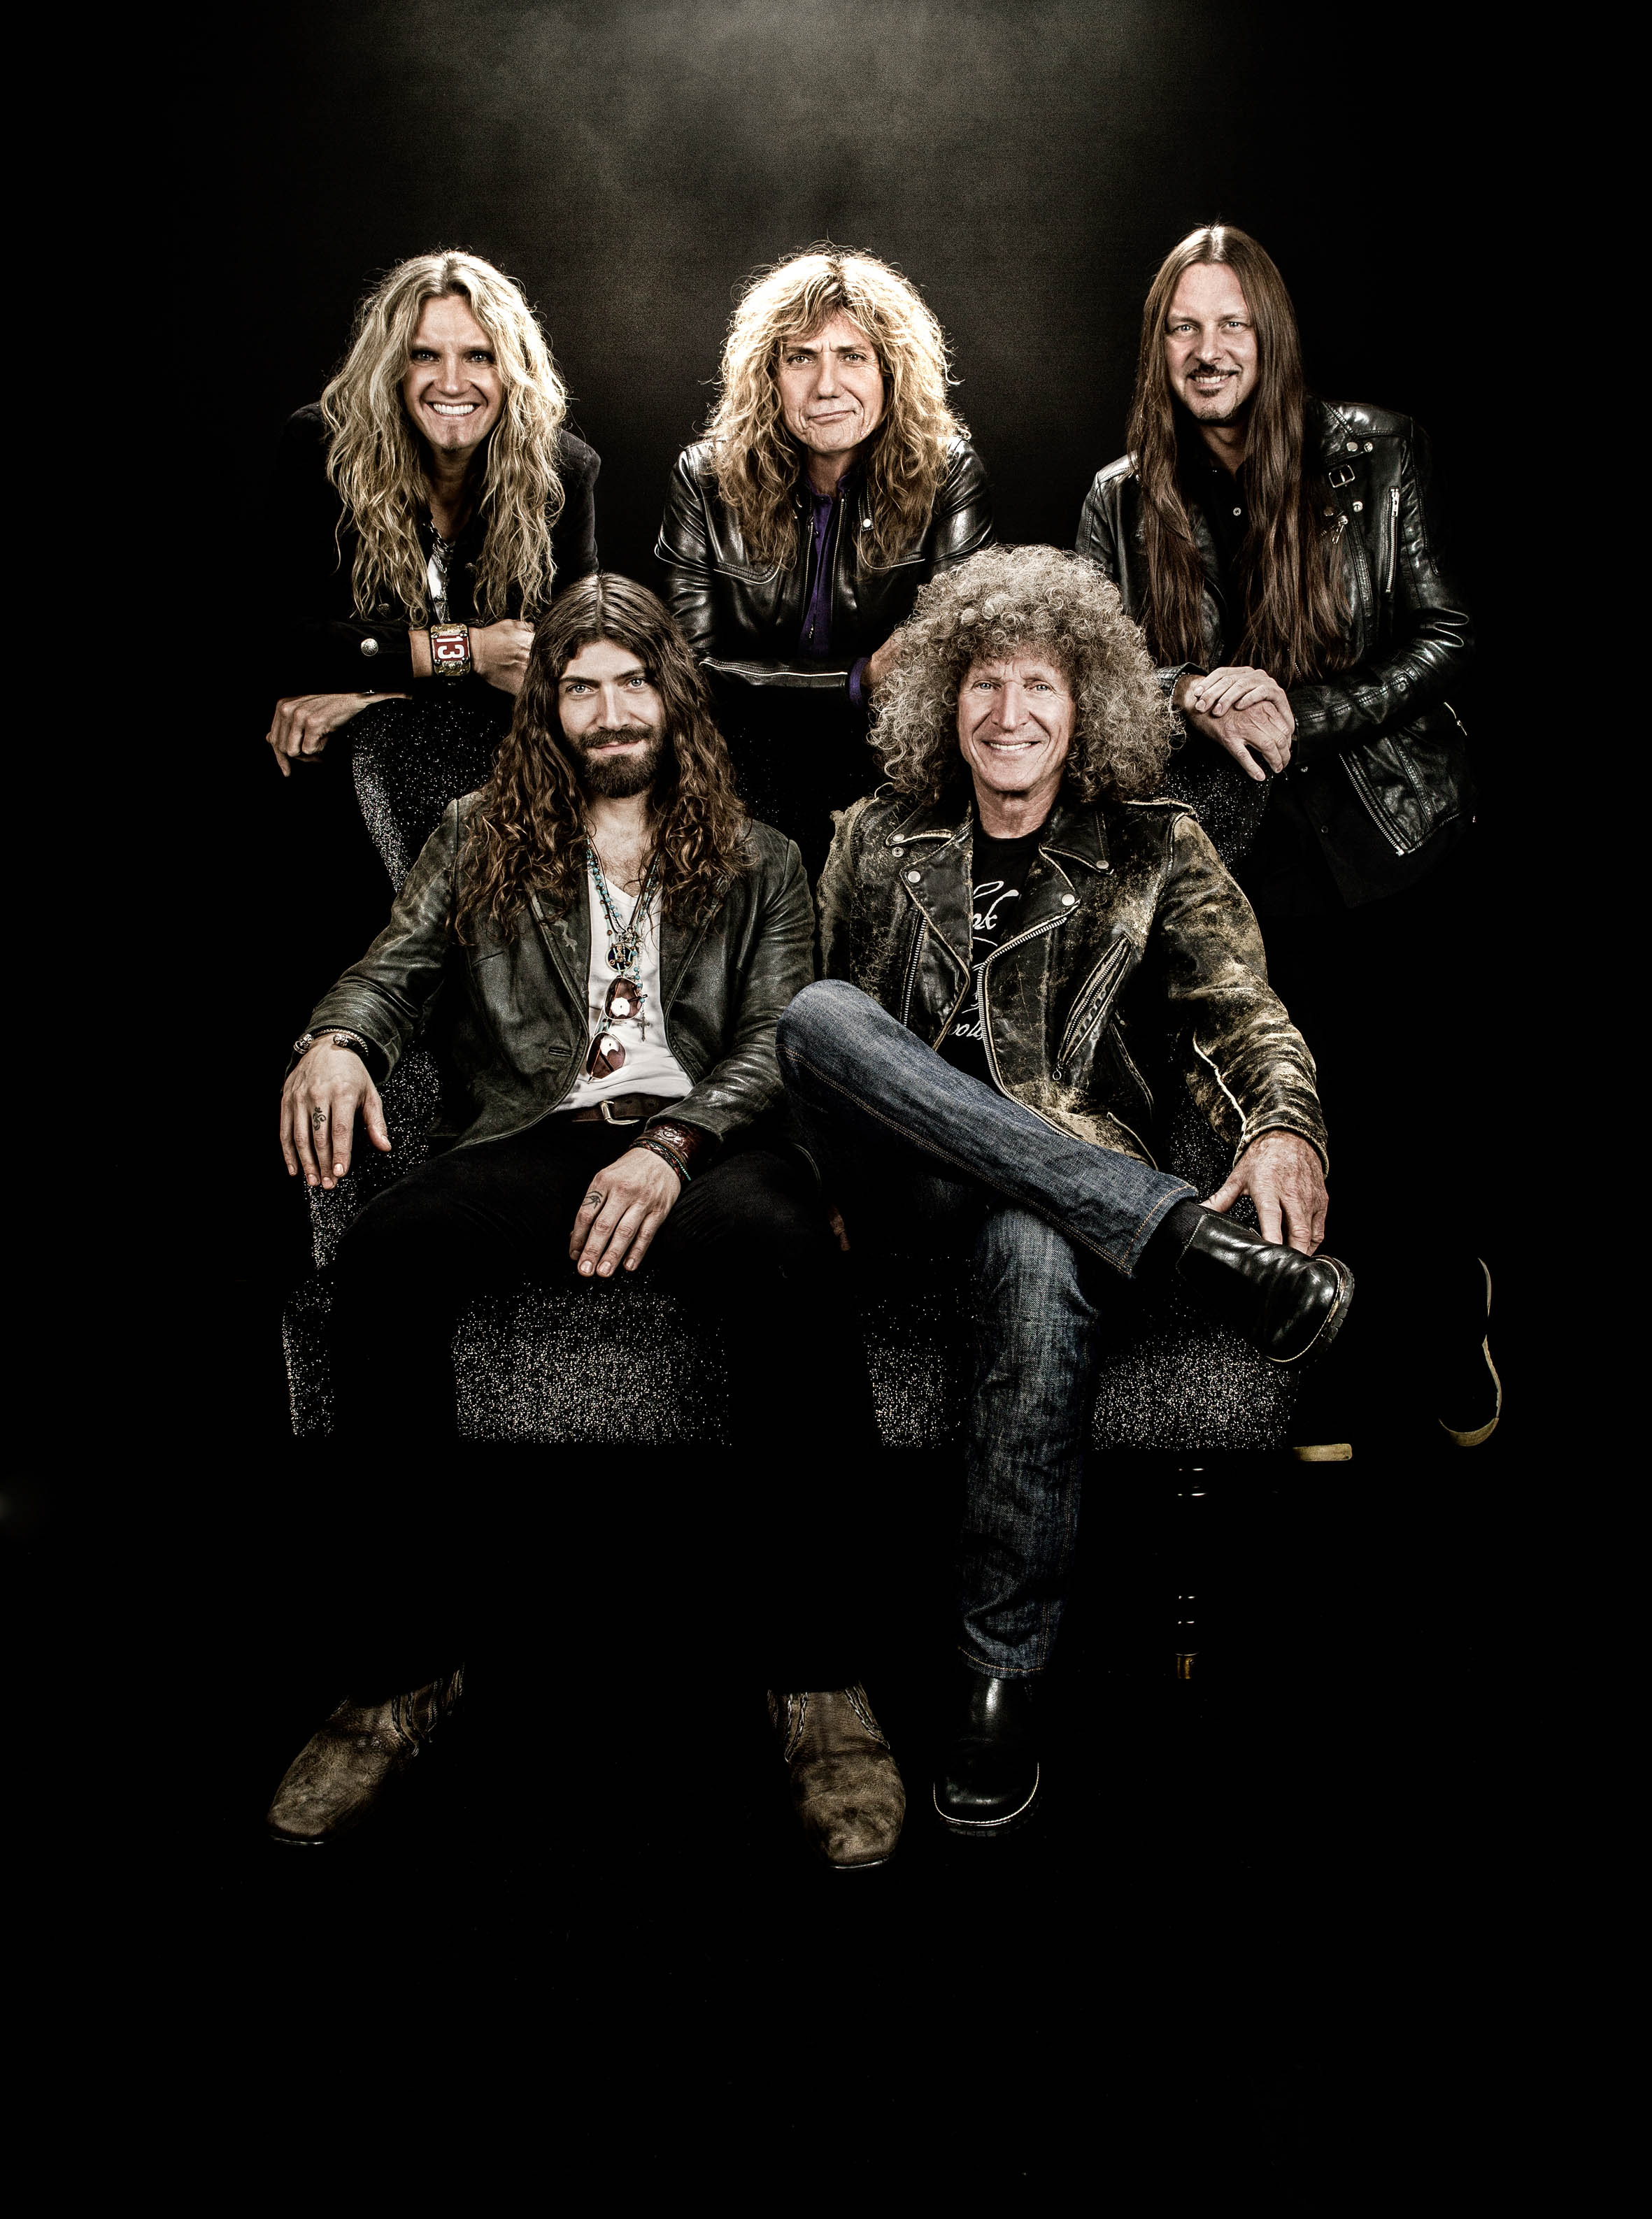 تب و نت The Deeper The Love از گروه Whitesnake